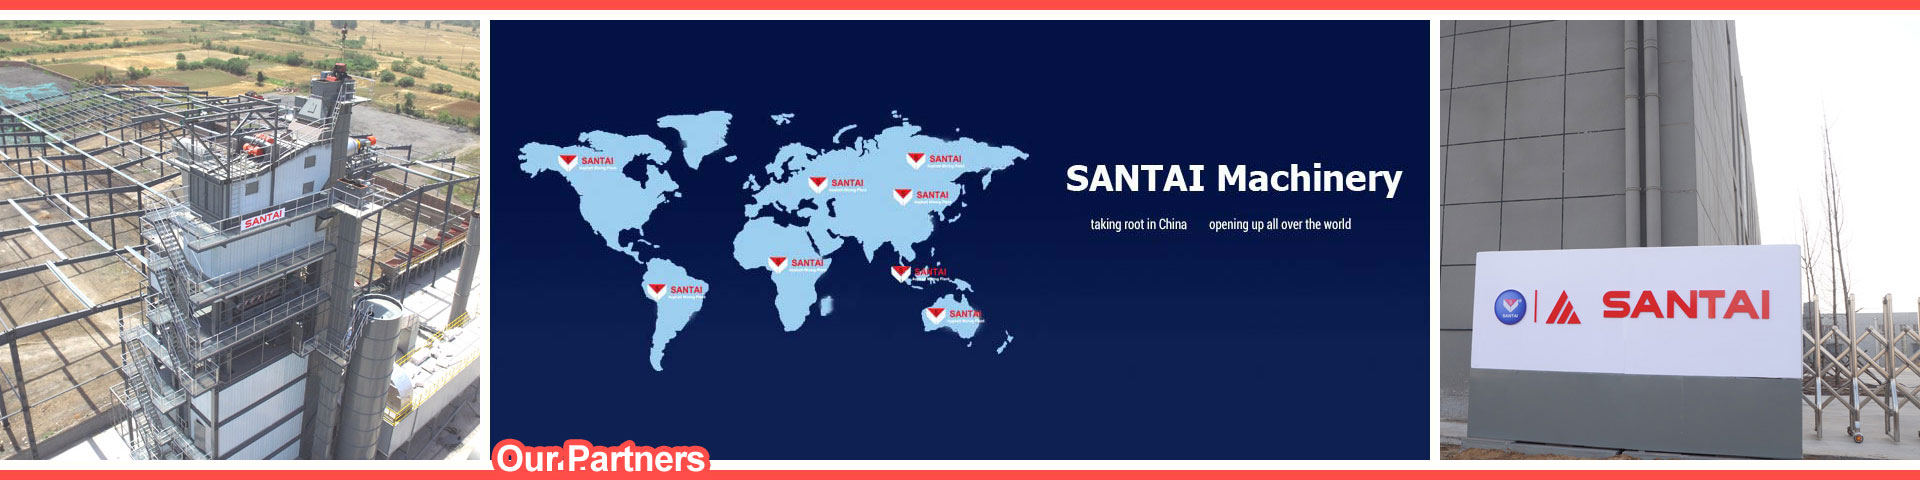 partners of asphalt plant manufacturers santai